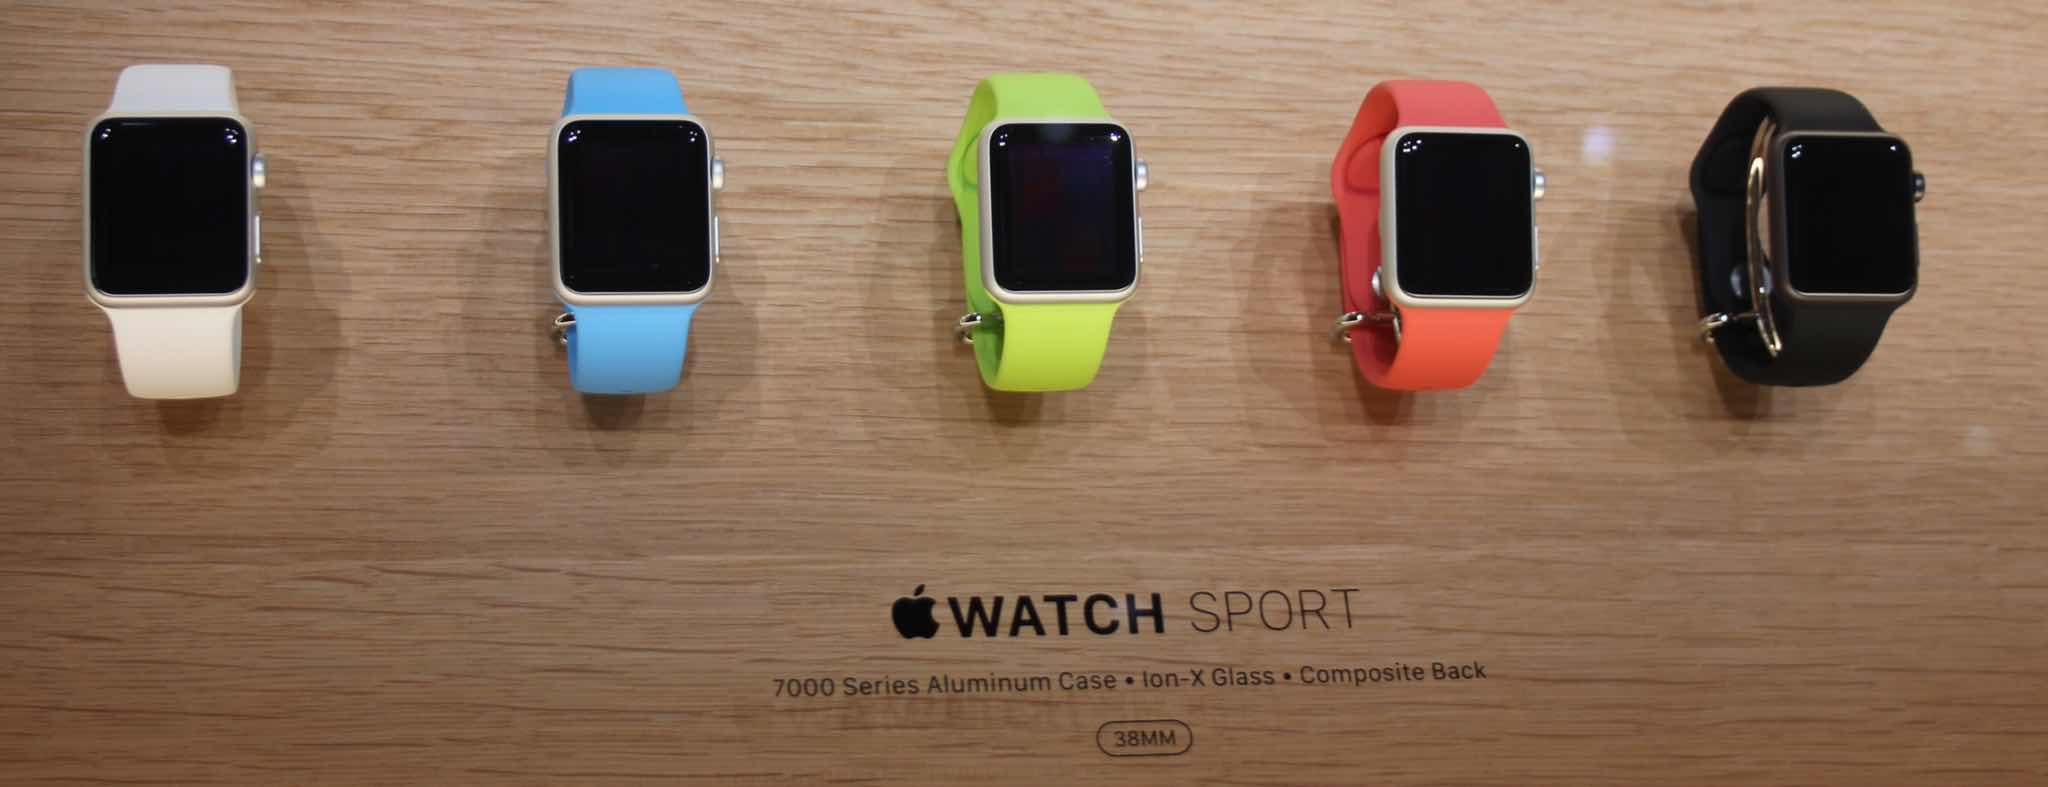 watchfaq-colors